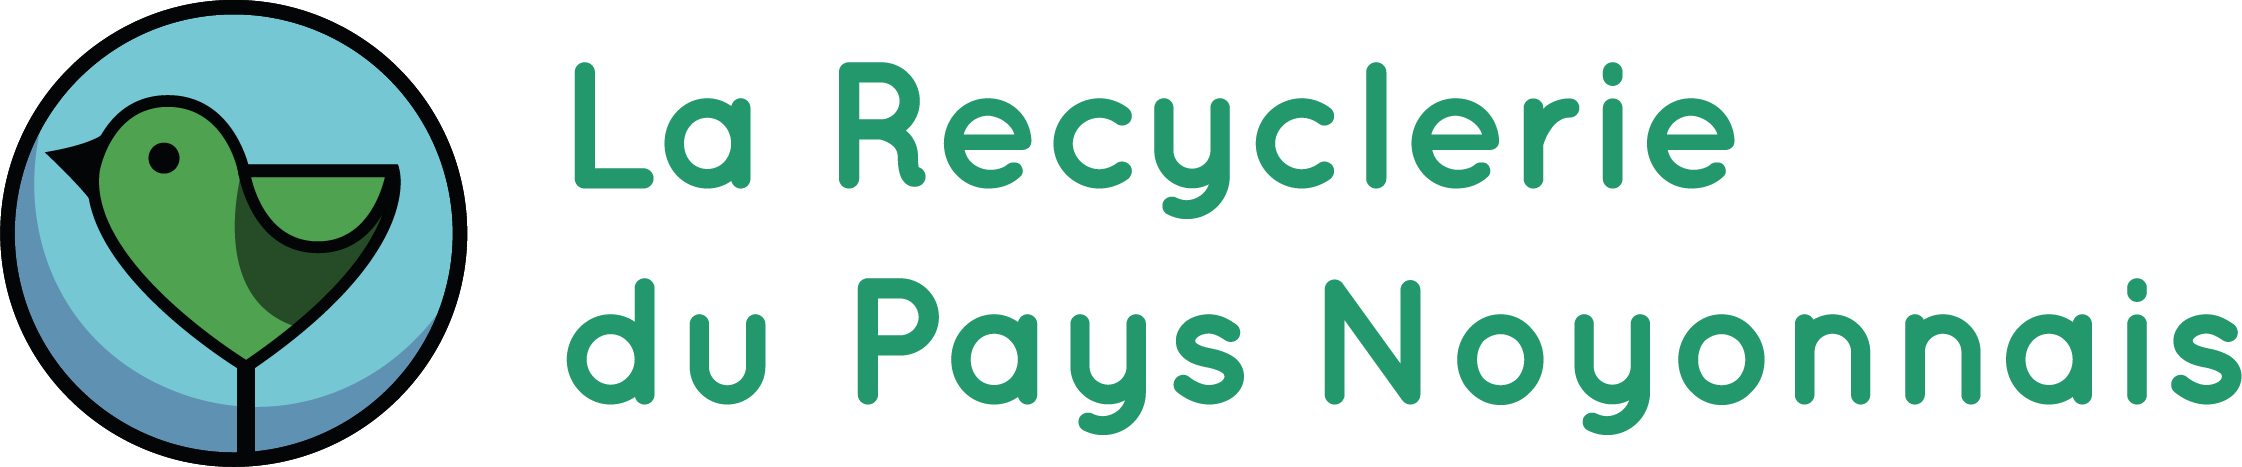 Recyclerie du Pays Noyonnais